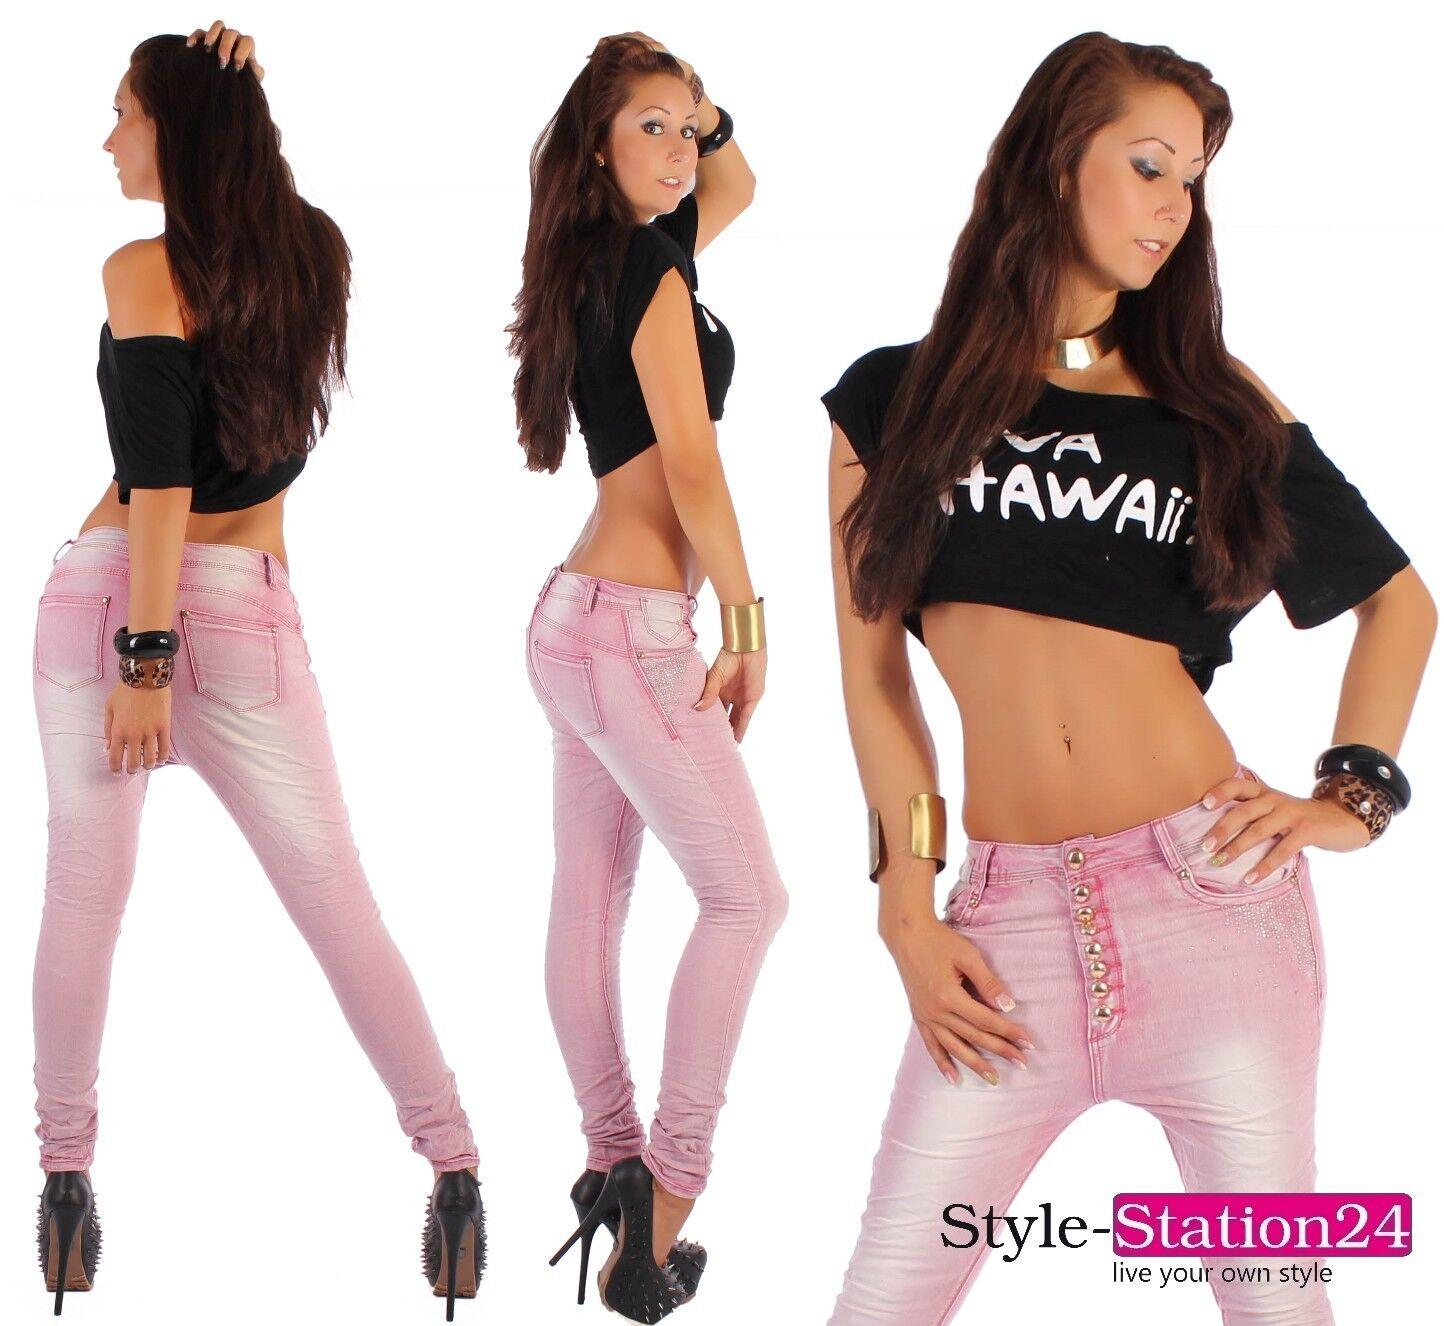 damen jeans hose antiform harem boyfriend skinny stretch rosa strass glitzer b13. Black Bedroom Furniture Sets. Home Design Ideas